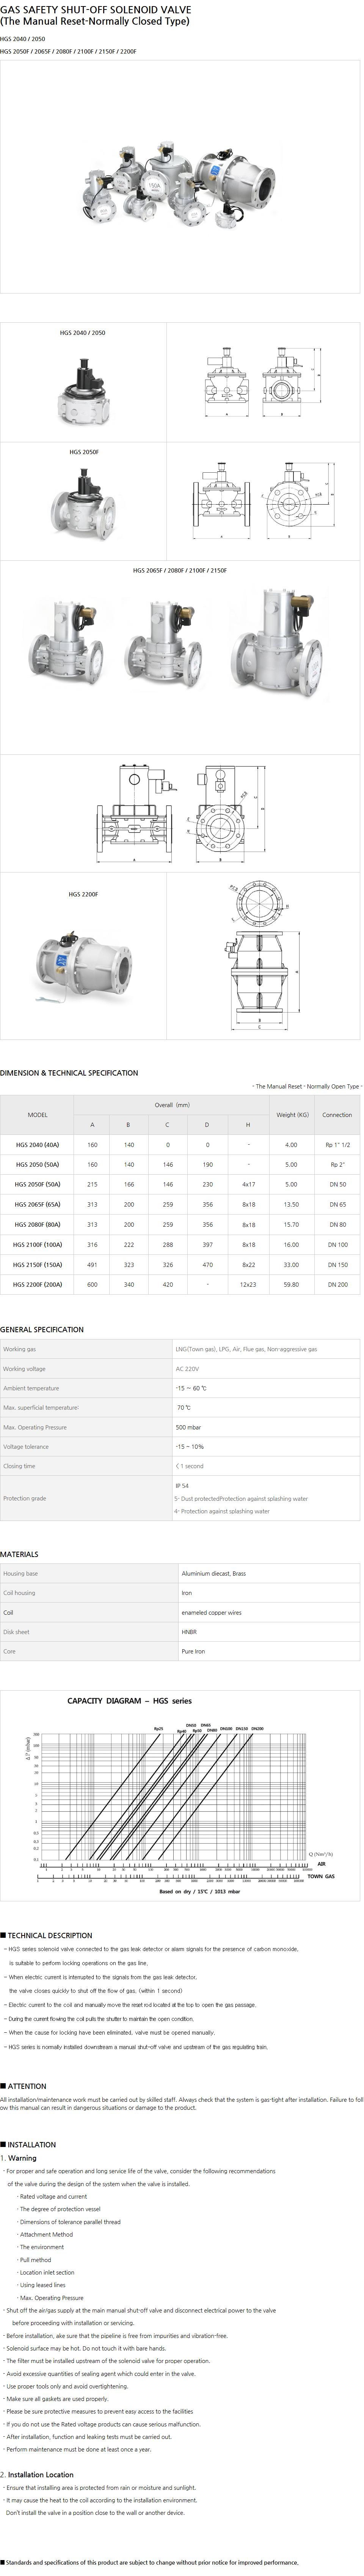 HYOSHIN MECHATRONICS Gas Safety Shut-off Solenoid Valve (Manual Reset)  1